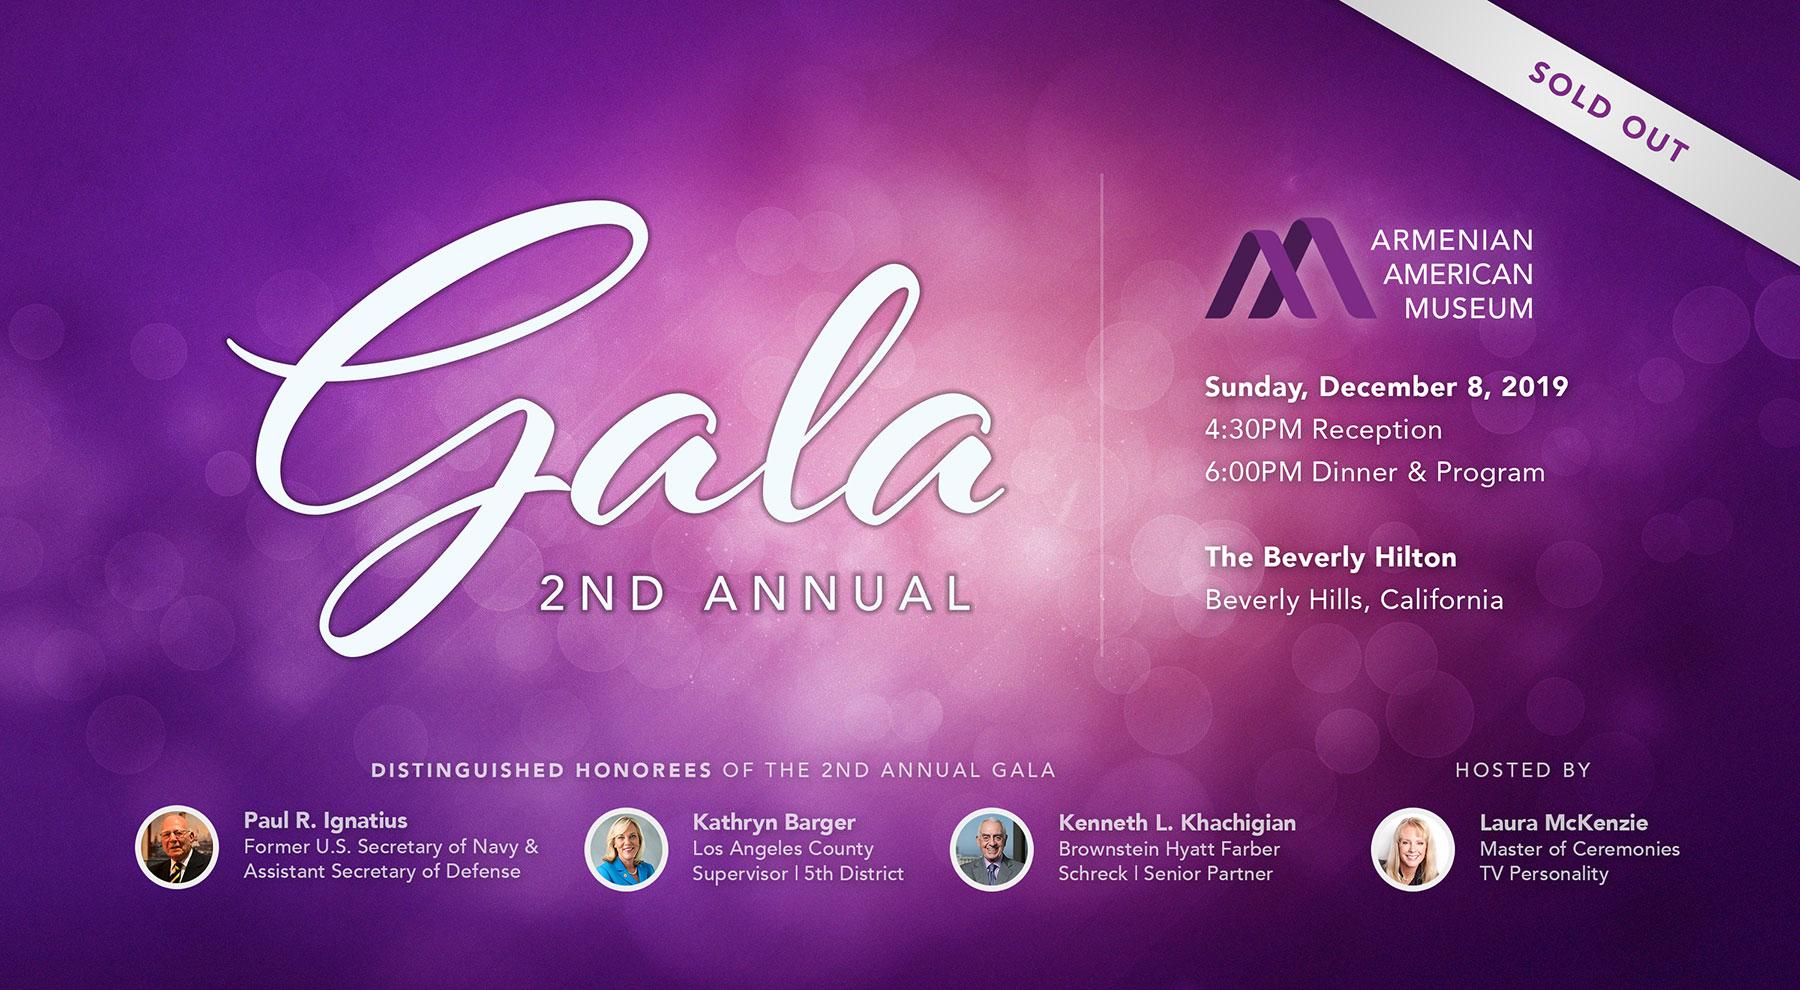 2nd Annual Armenian American Museum Gala